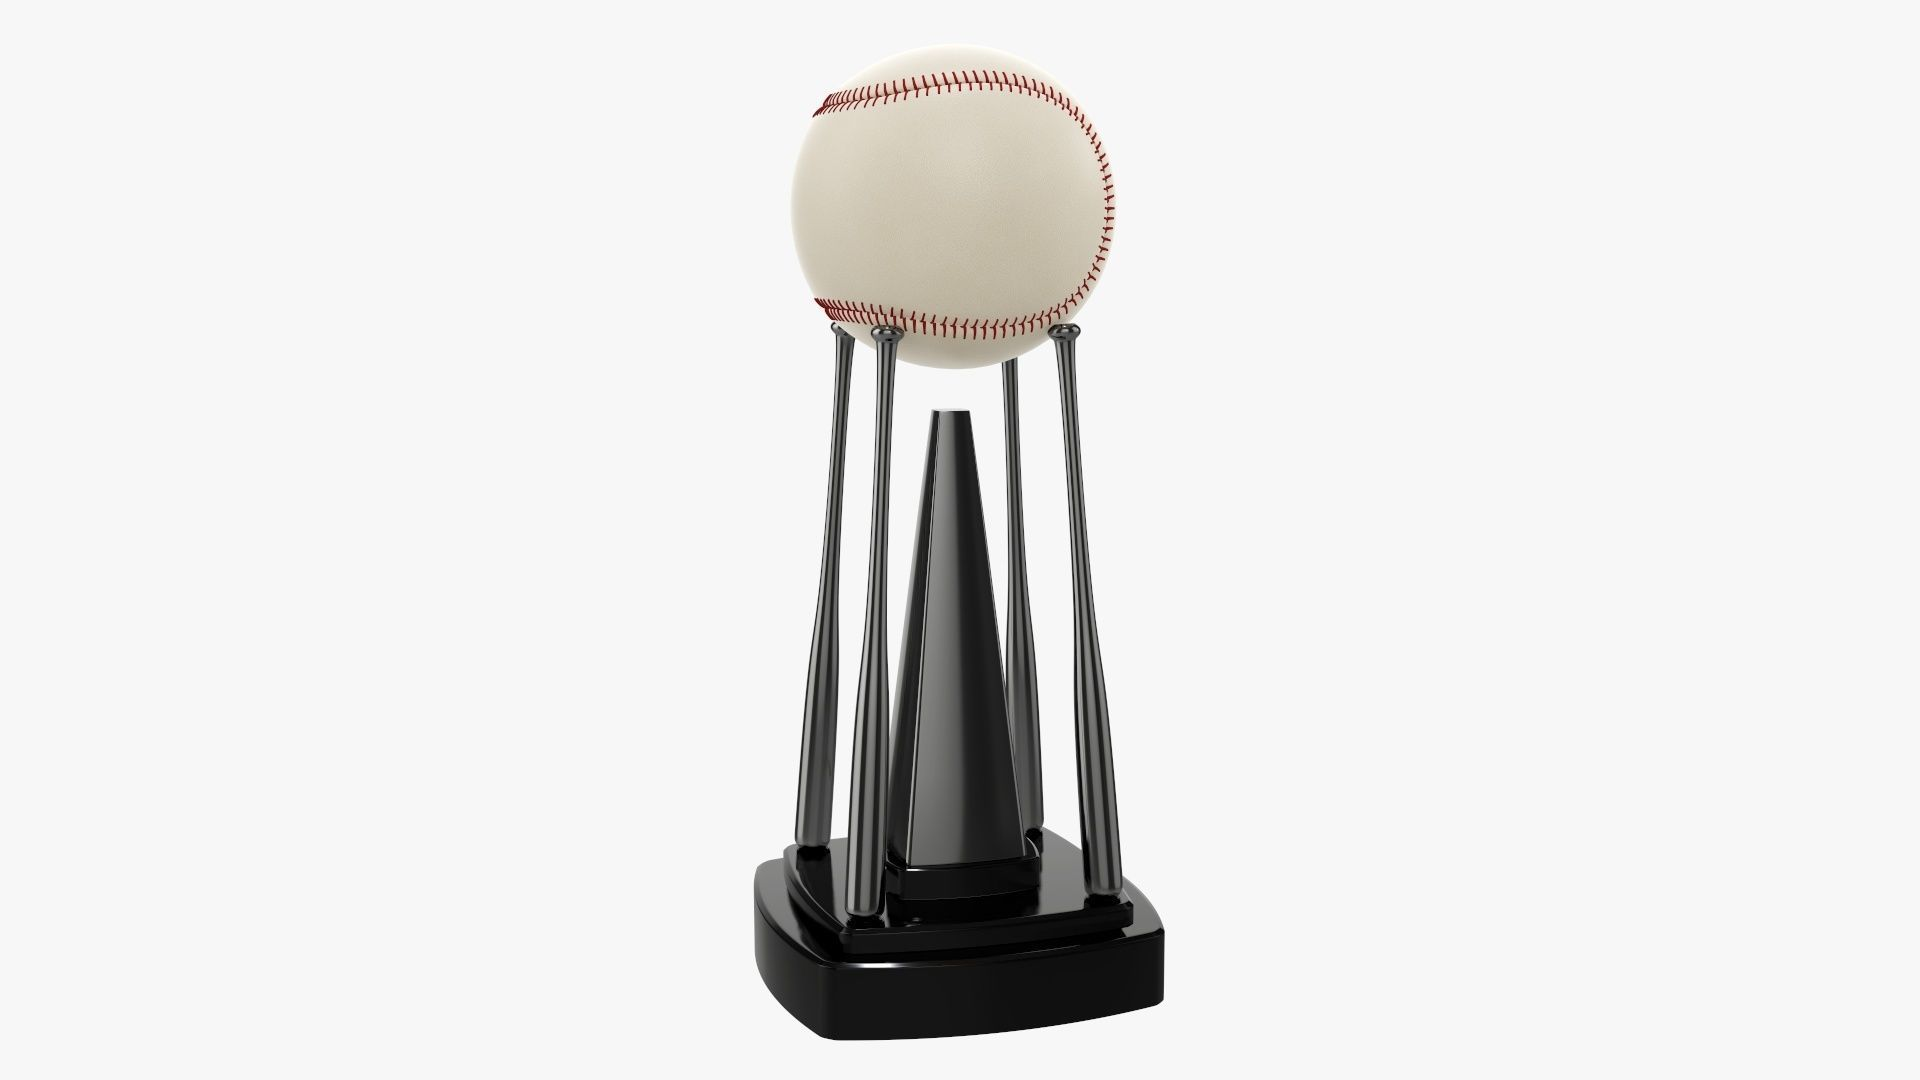 Trophy baseball ball and bats 02